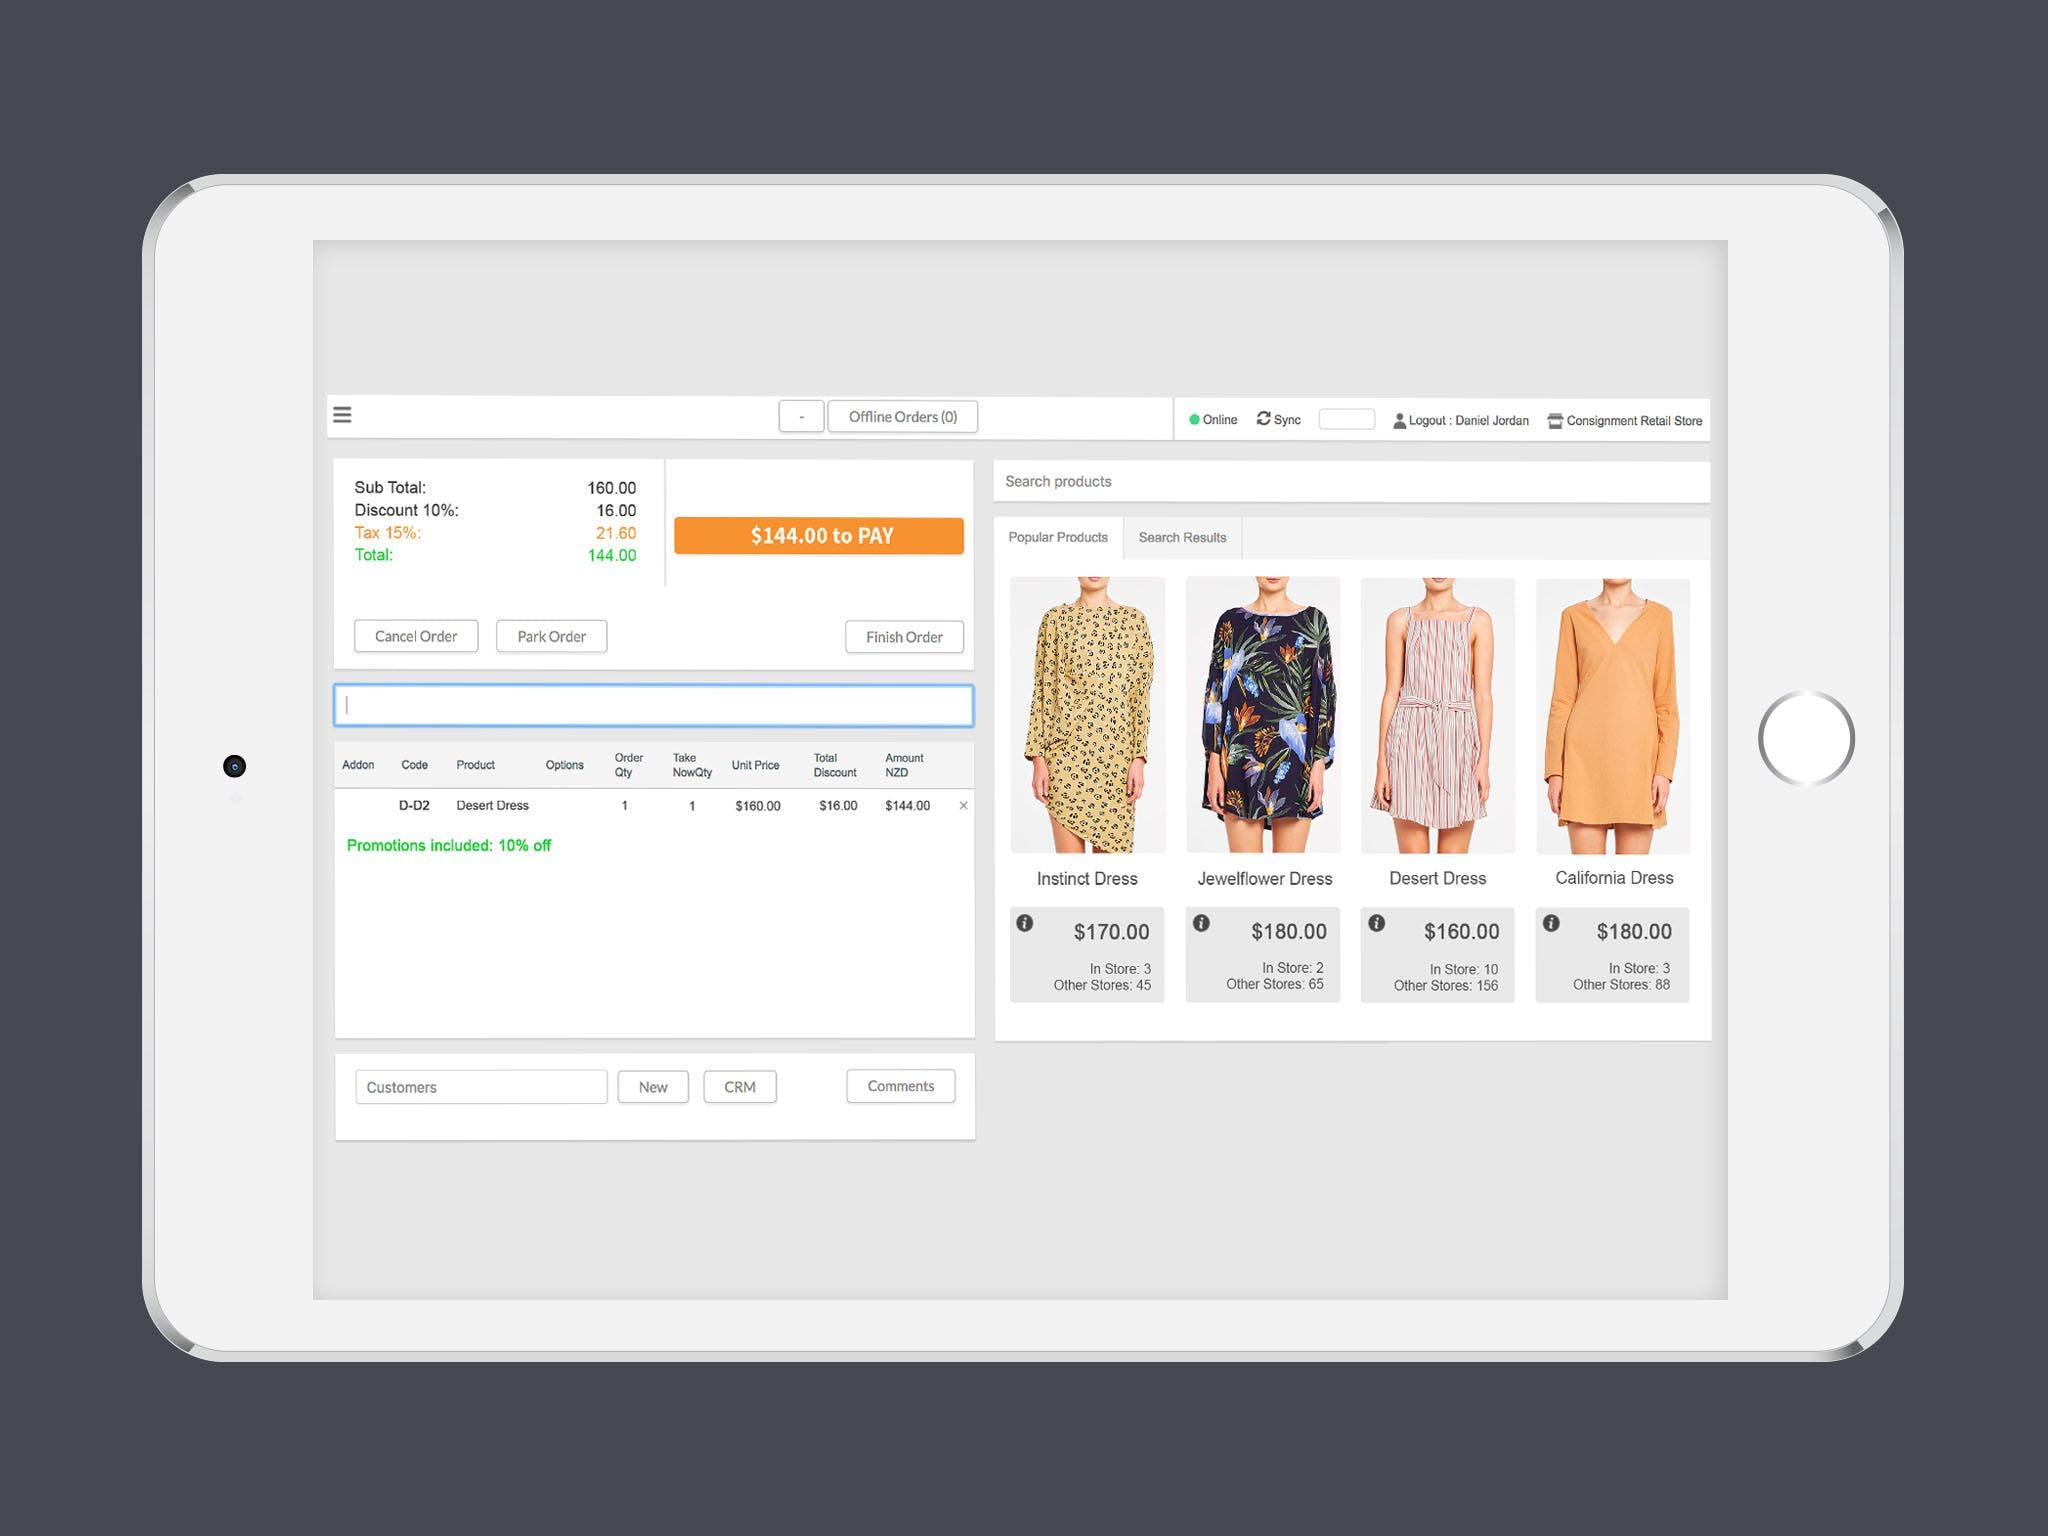 Cin7 Software - Cin7 mobile device interface